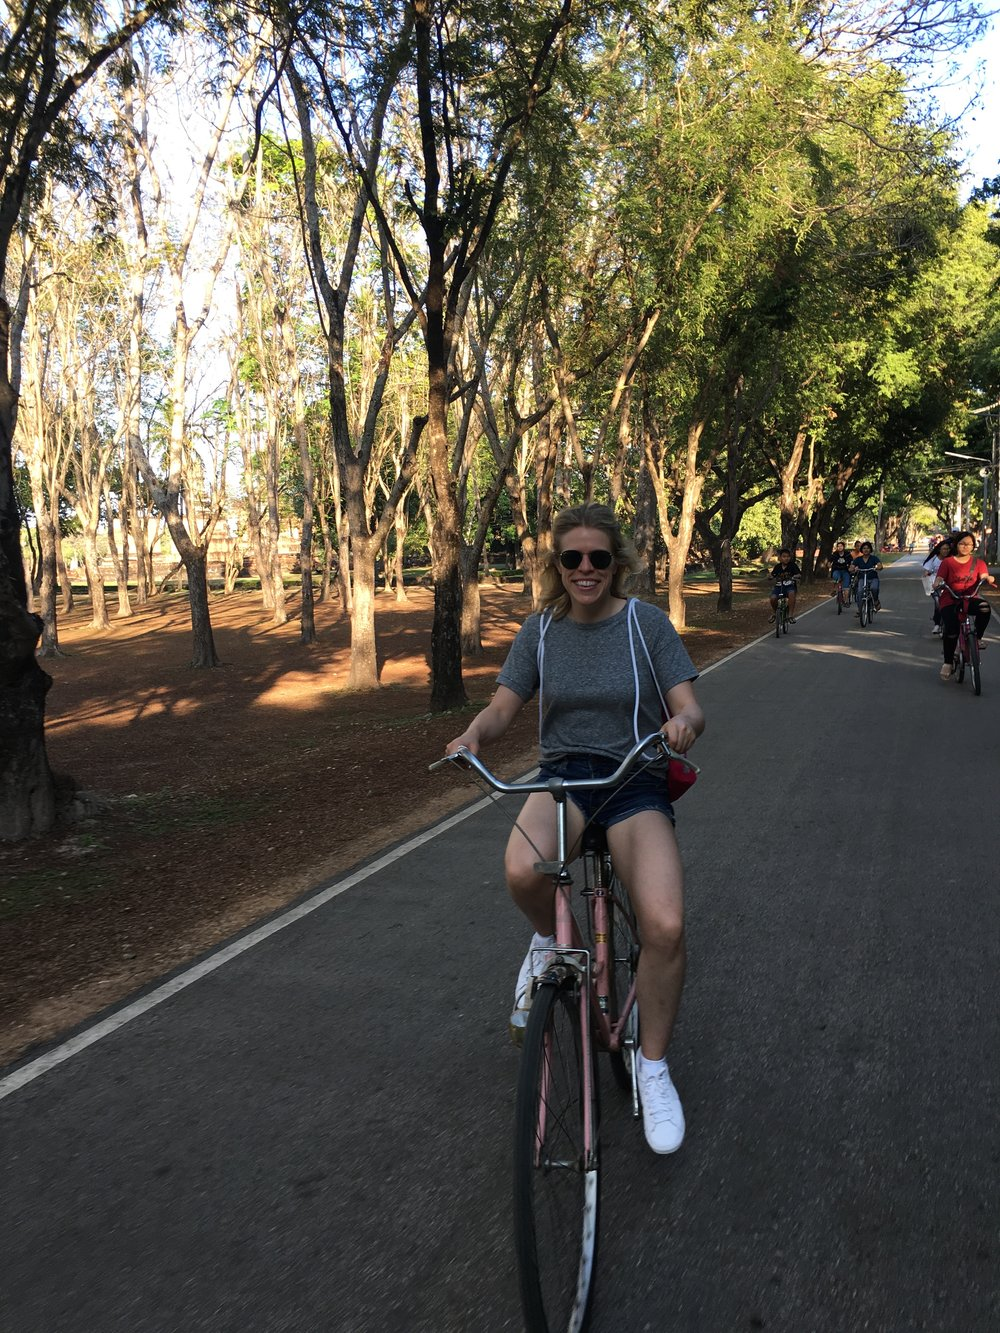 Here I am really enjoying the ride, who knew!